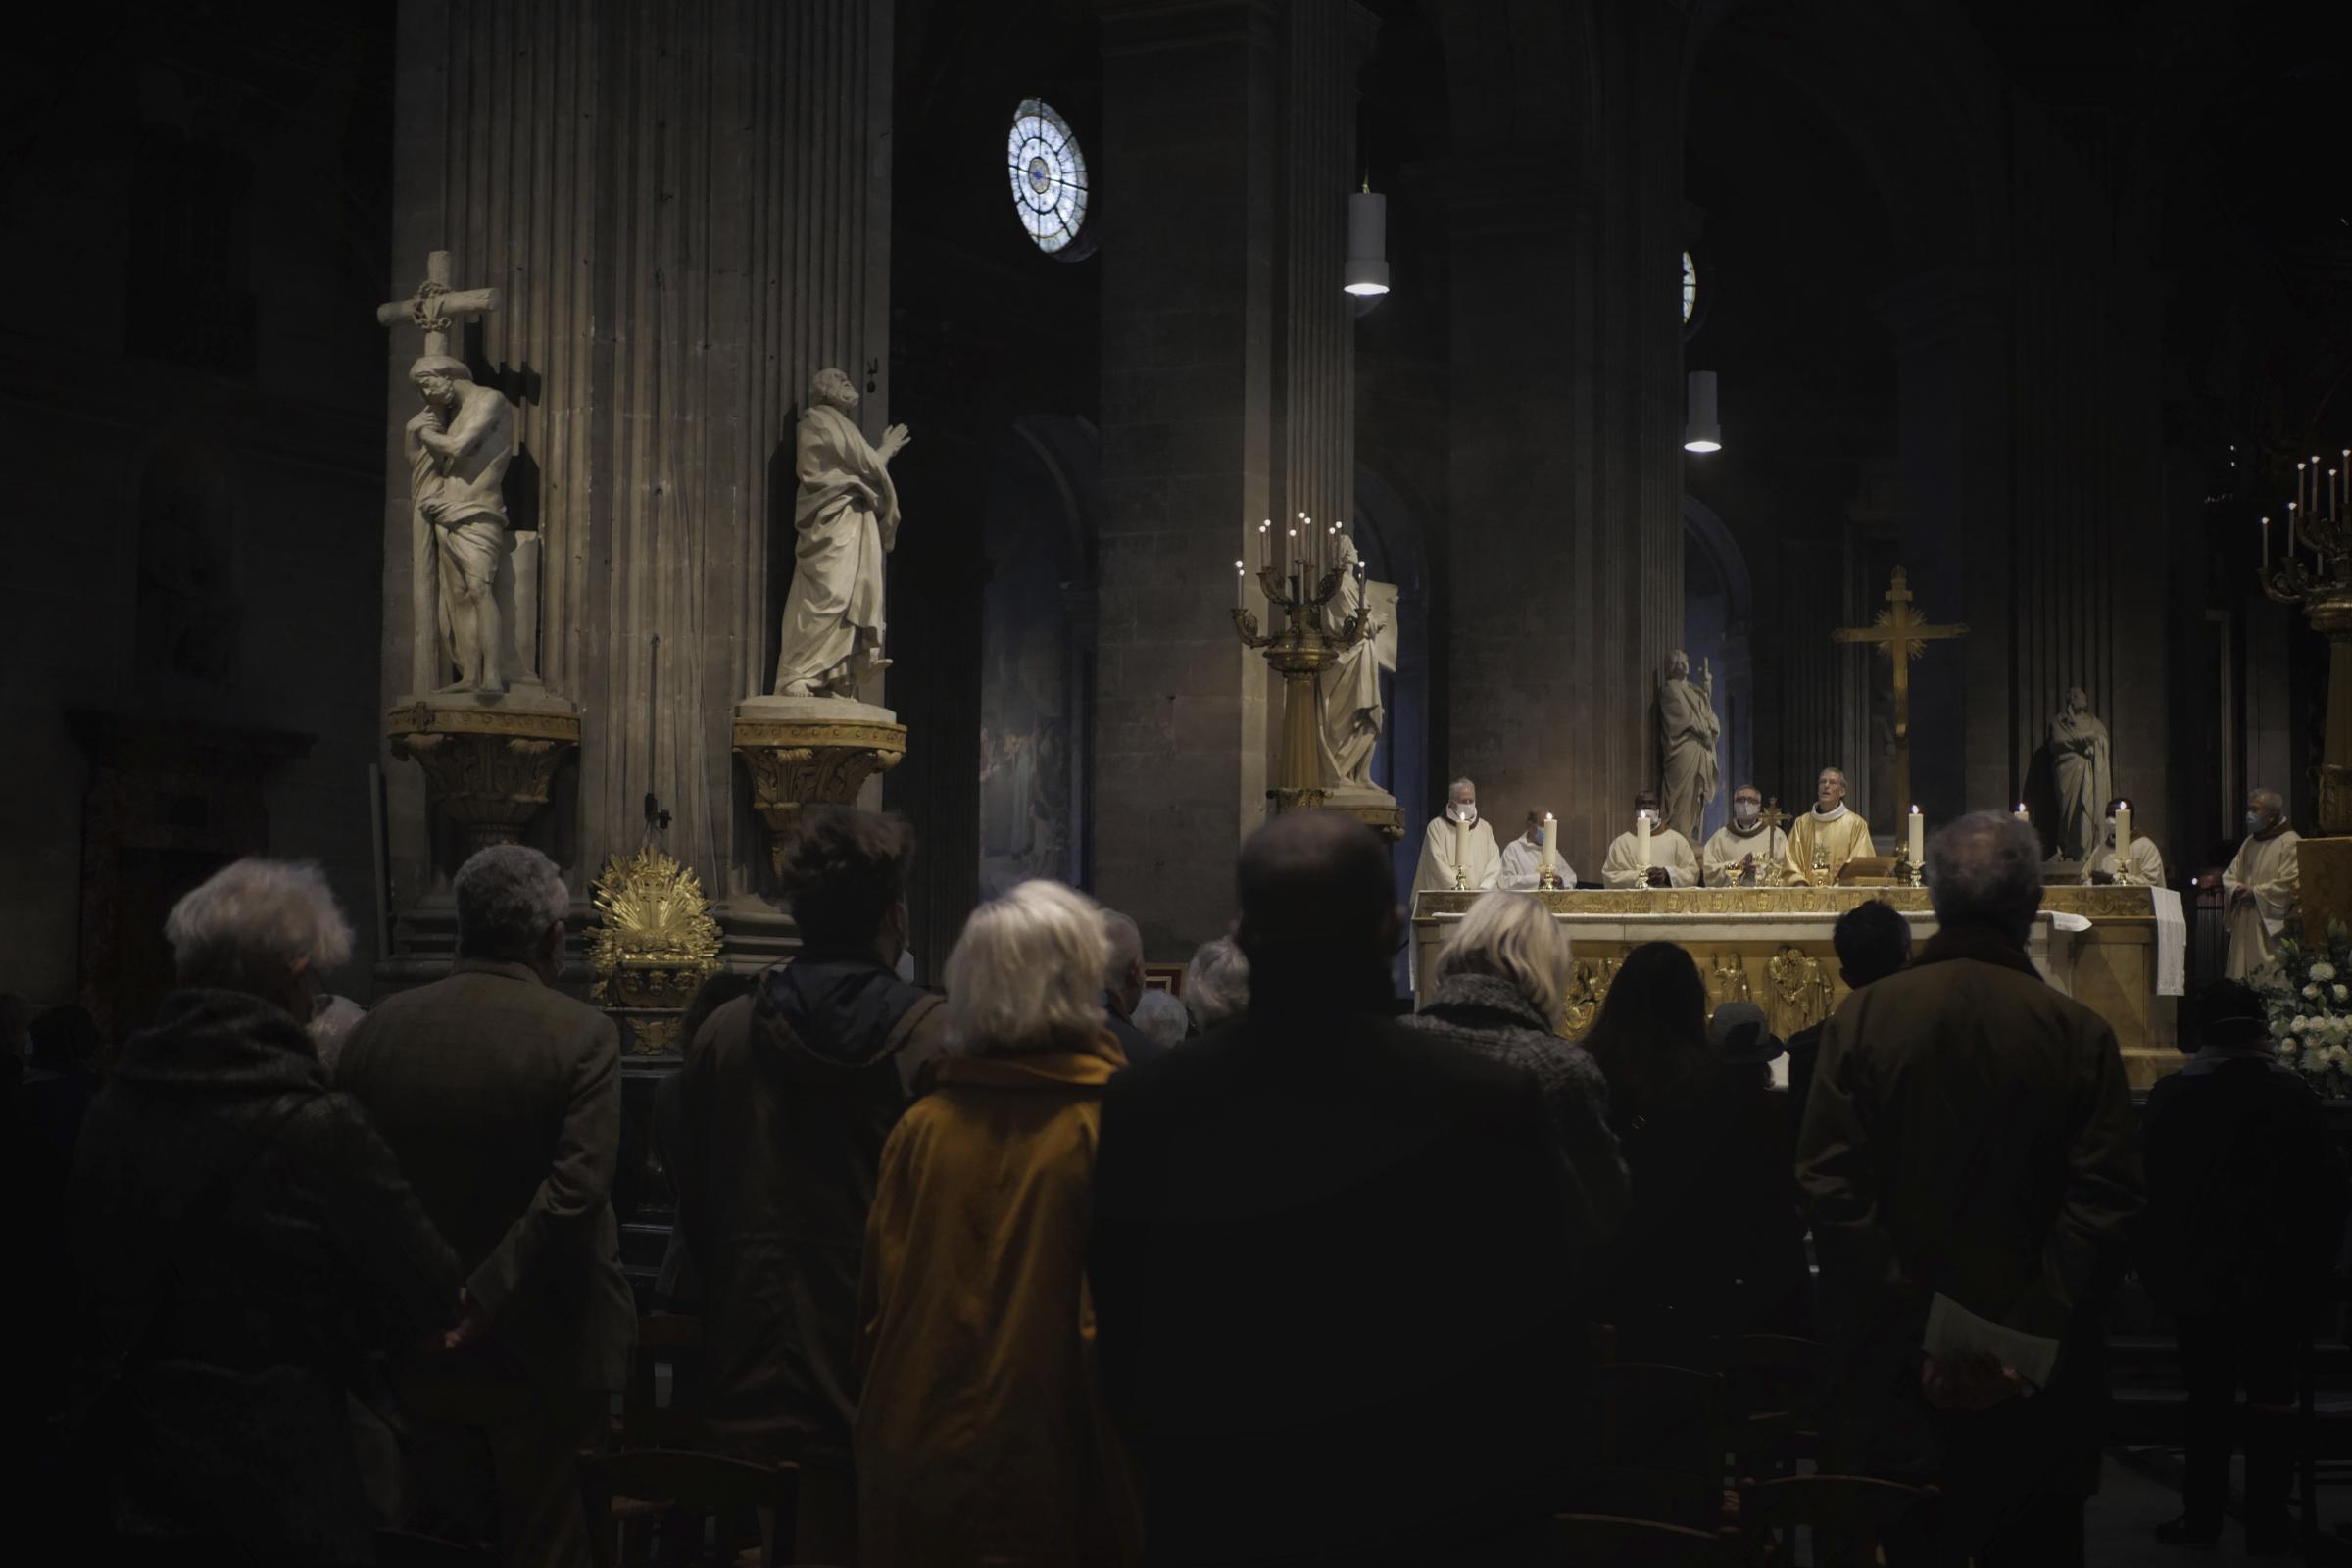 Lo scontro tra Macron e i vescovi